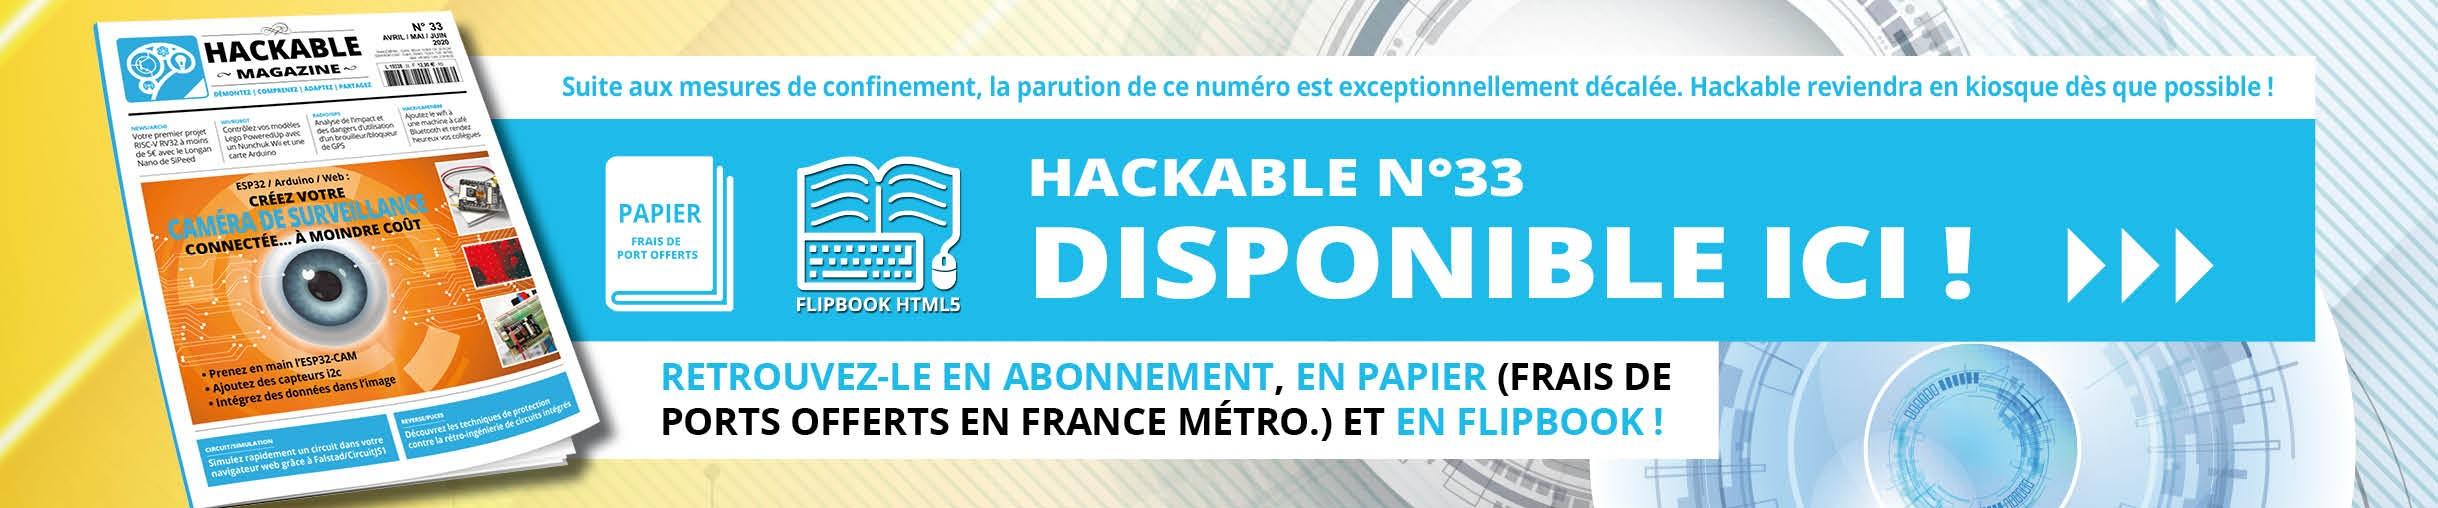 Hackable n°33